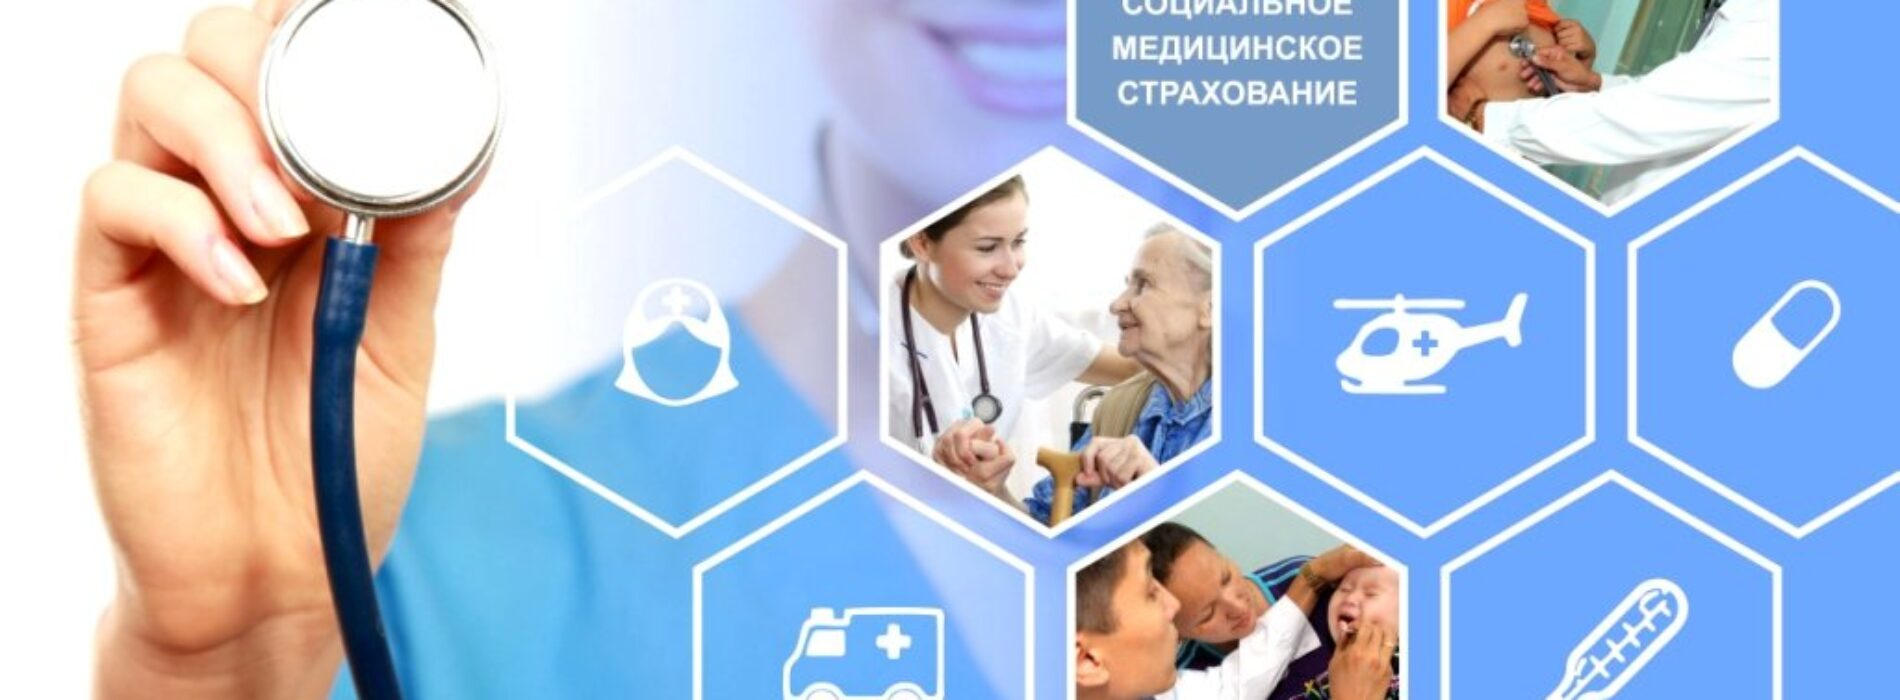 «Adaldyq alany» проведет мониторинг Фонда «ОСМС» по запросу СМИ